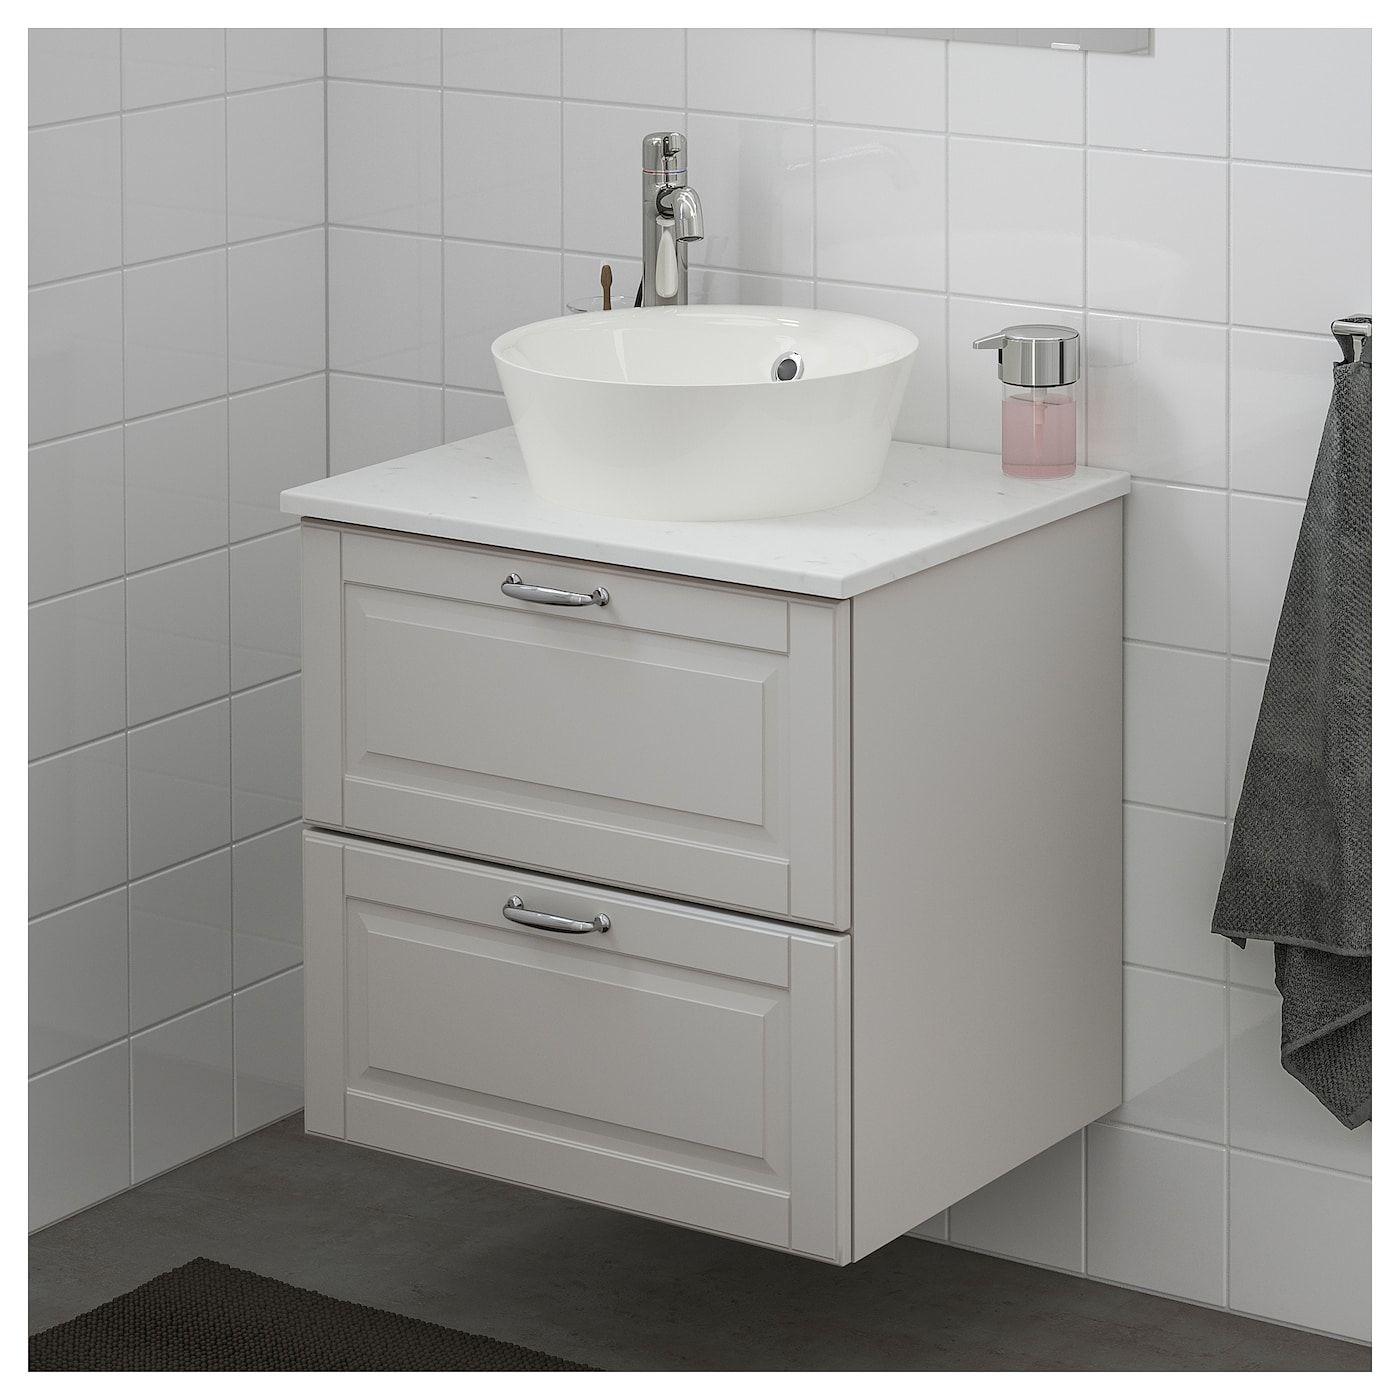 Mobel Einrichtungsideen Fur Dein Zuhause Ikea Godmorgon Bathroom Vanity Sink Cabinet